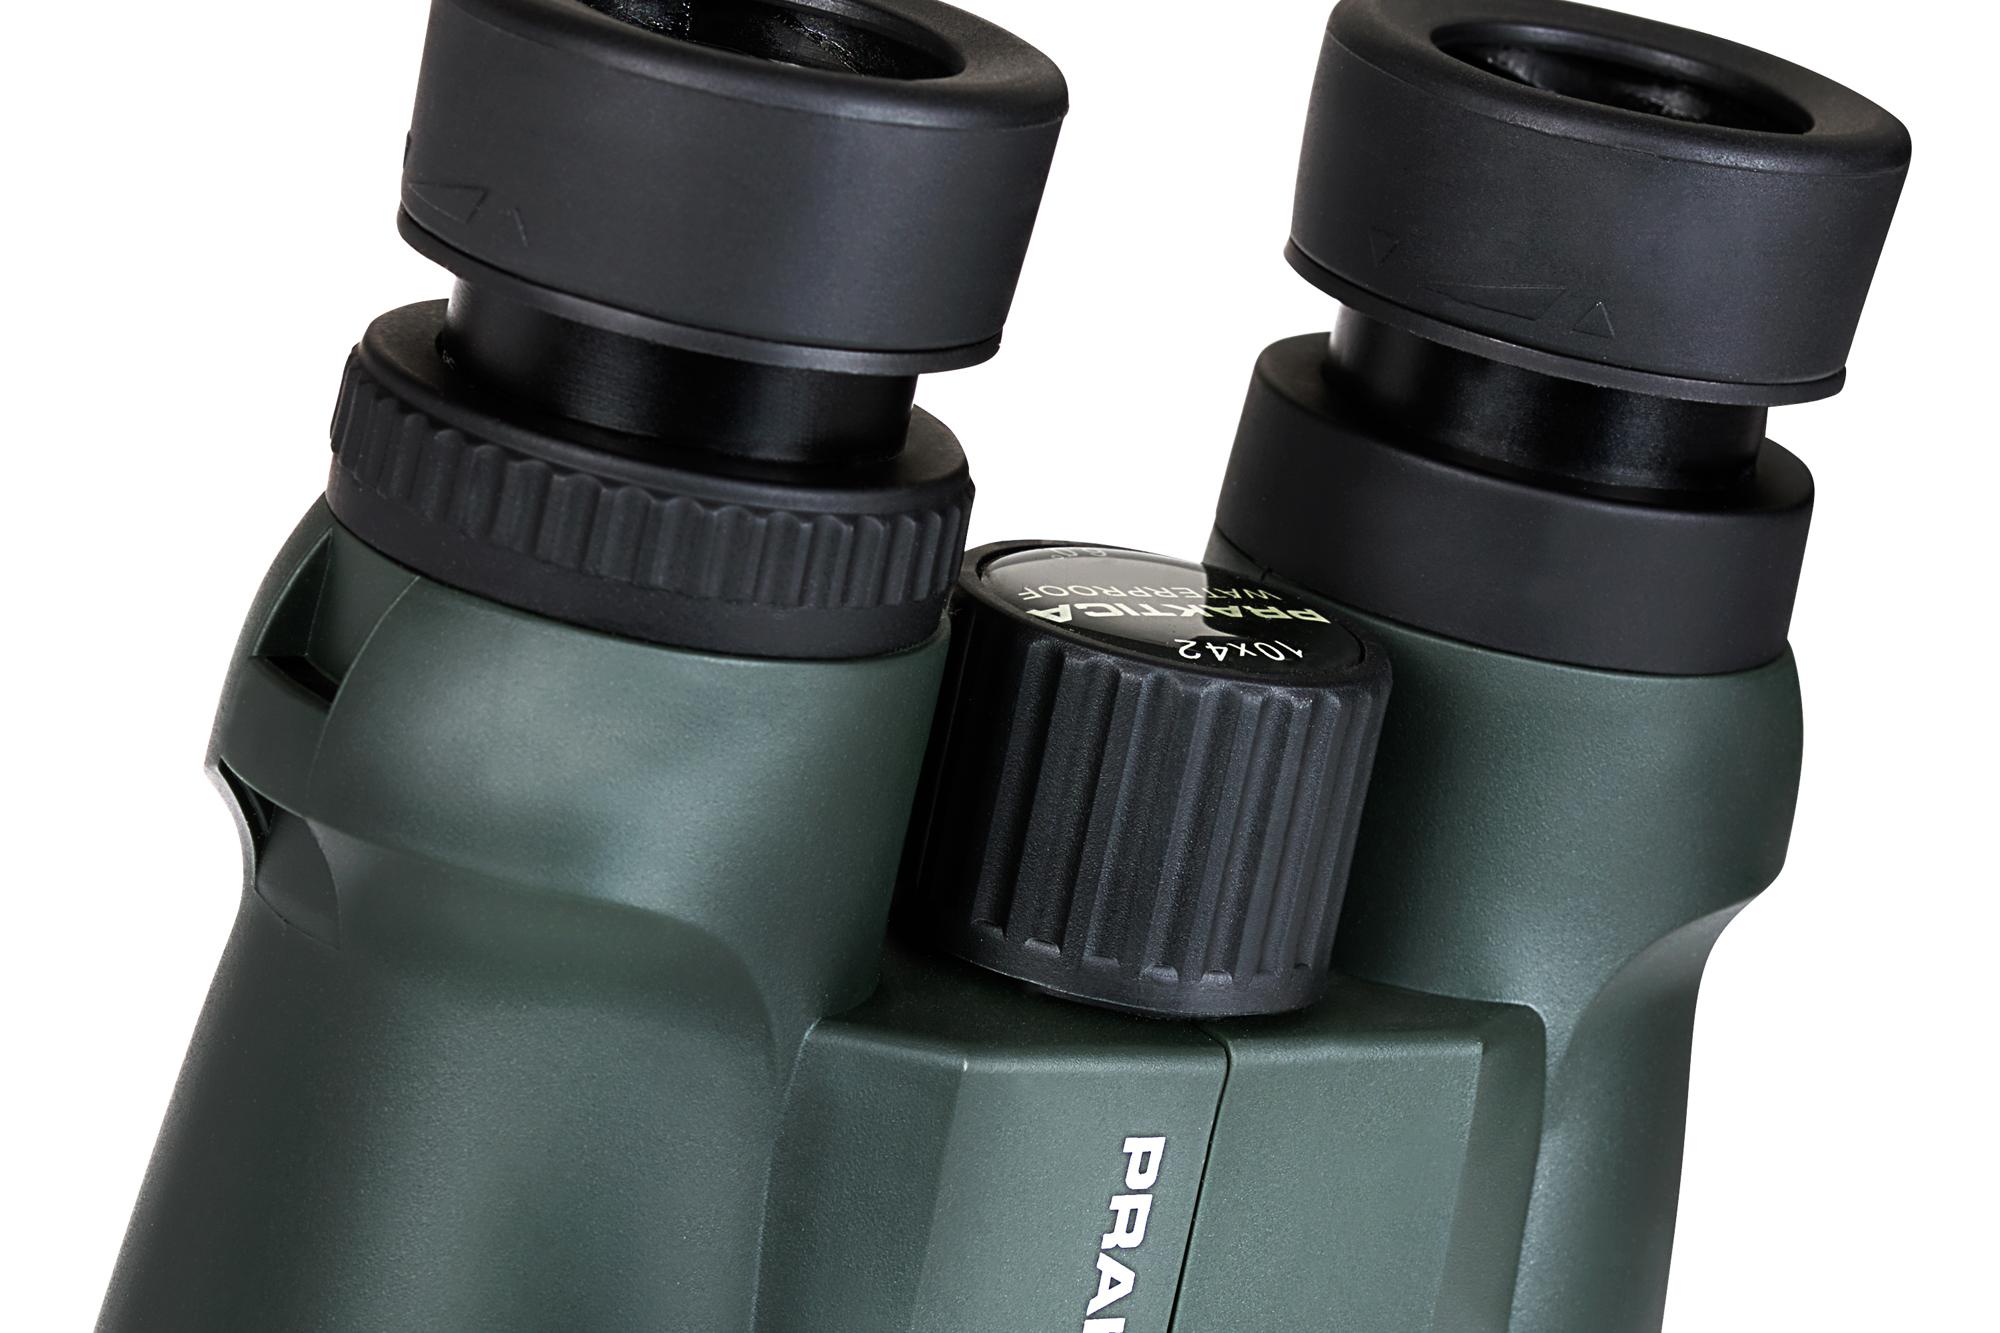 Praktica mm waterproof binoculars green cder g £ london